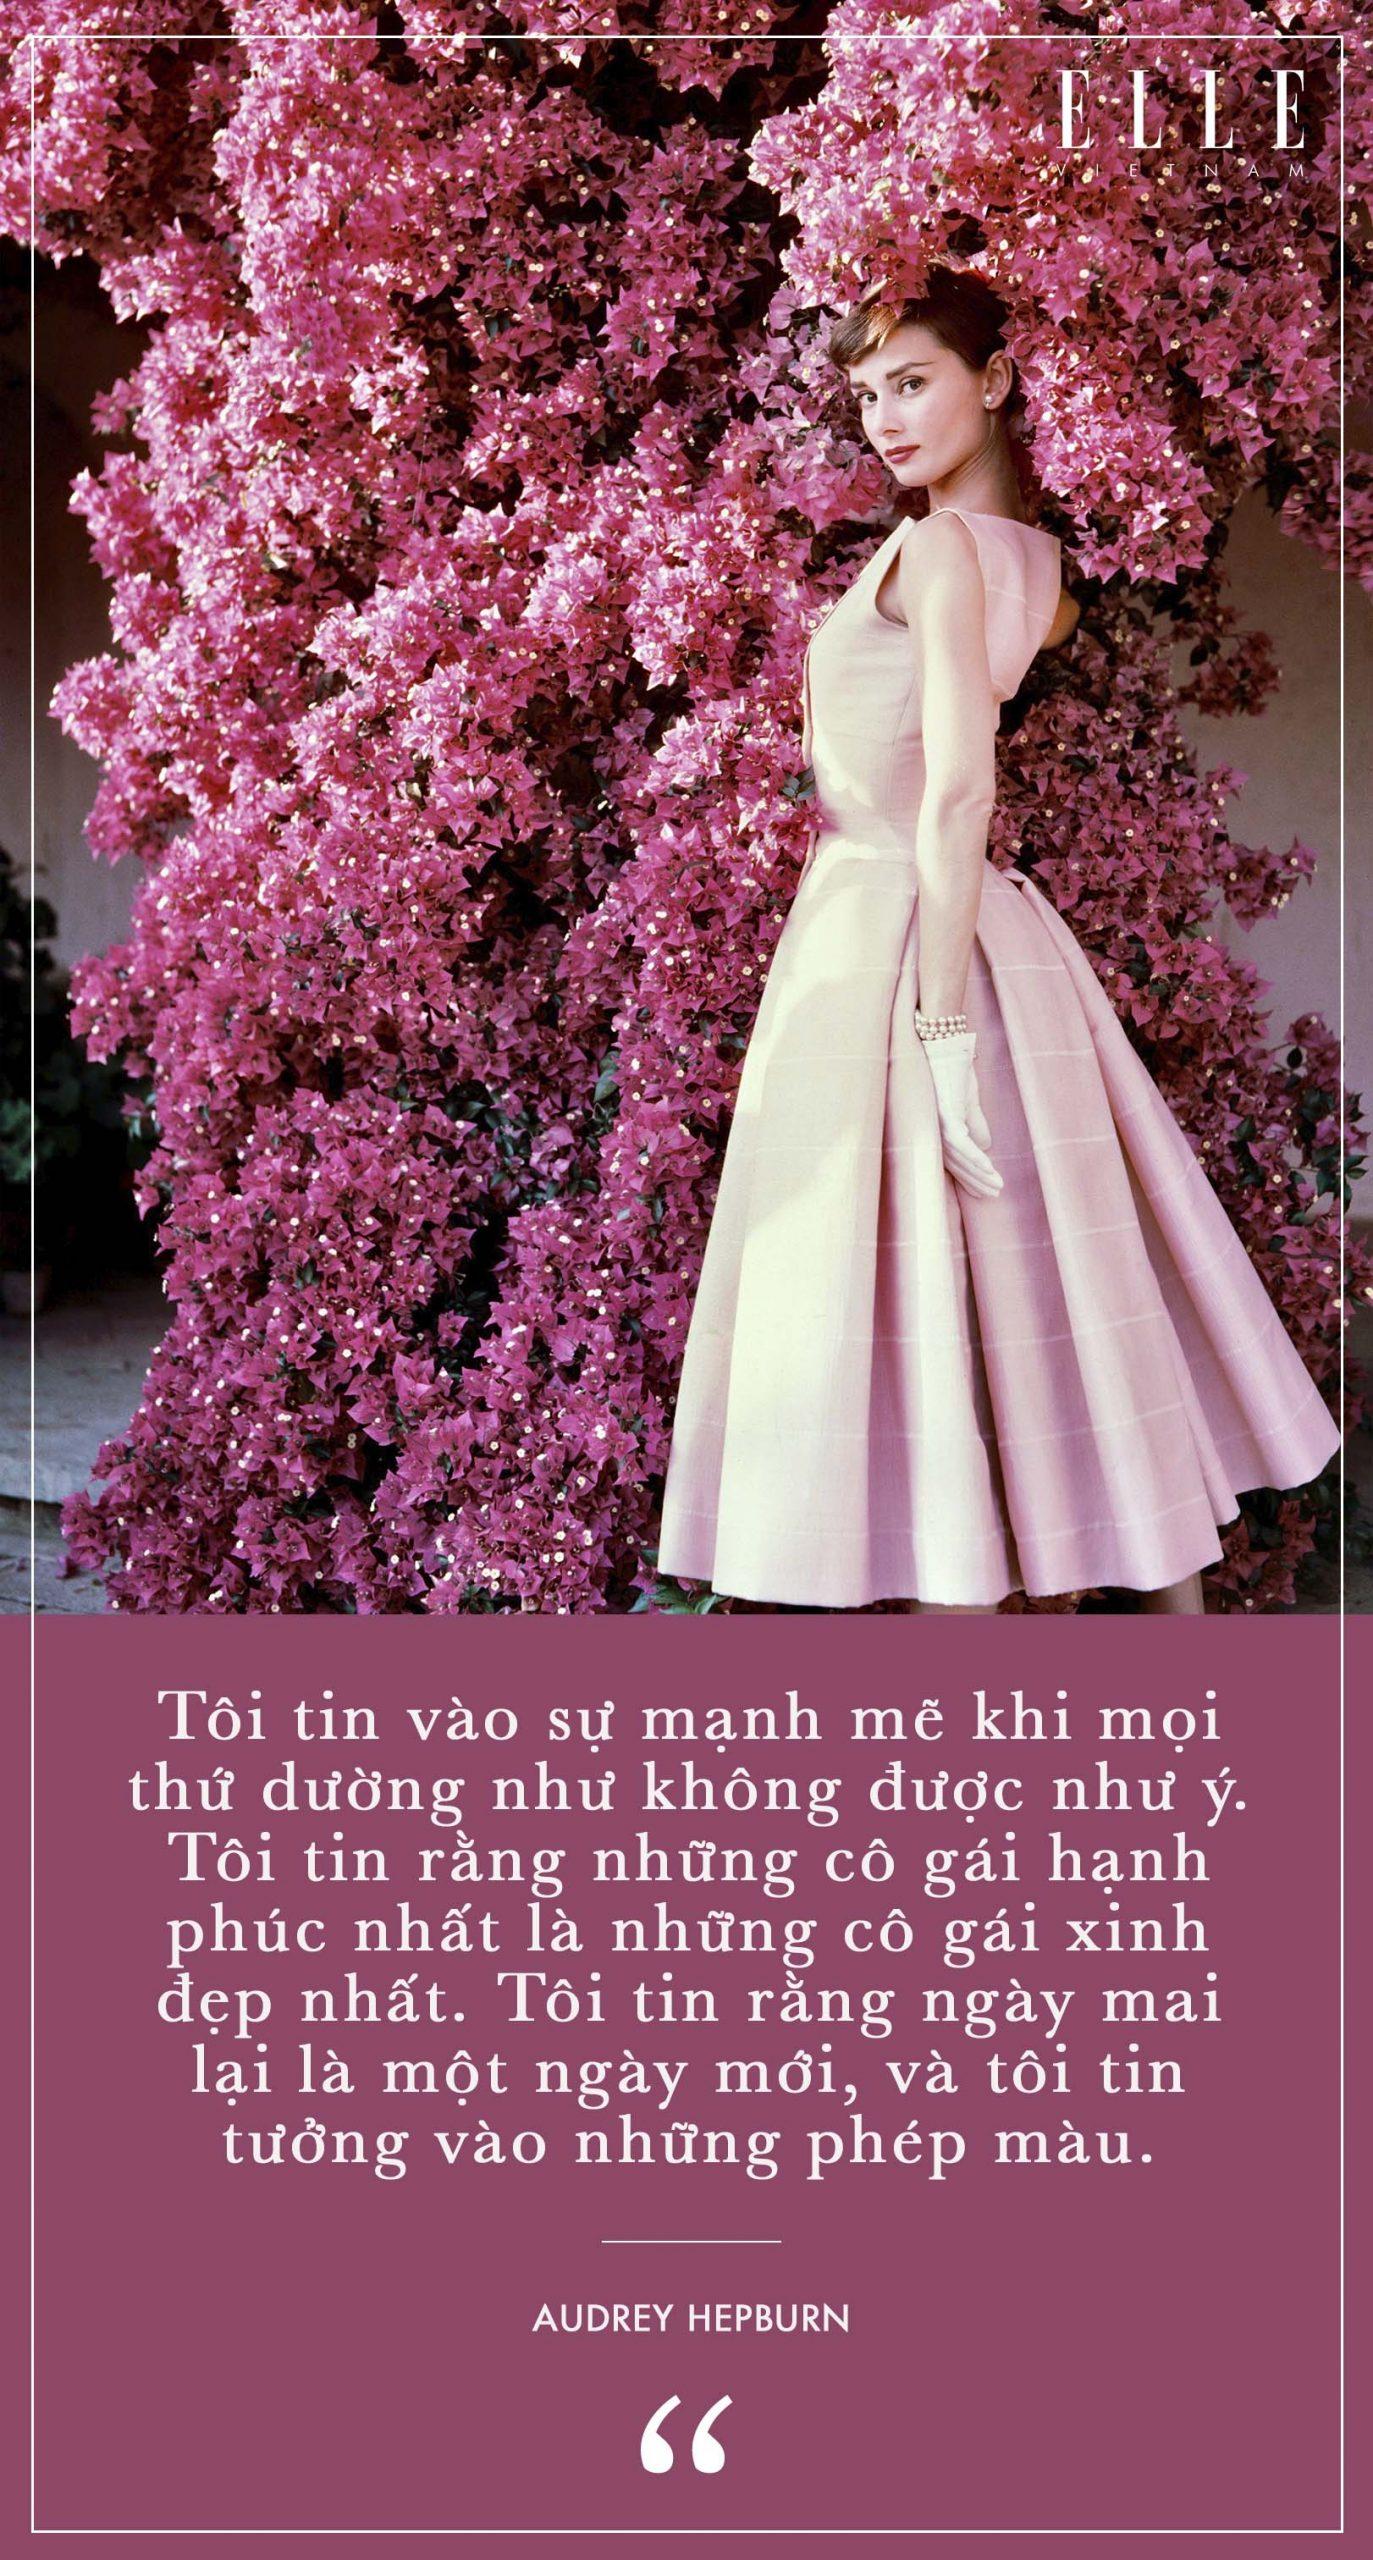 diễn viên Audrey Hepburn 4